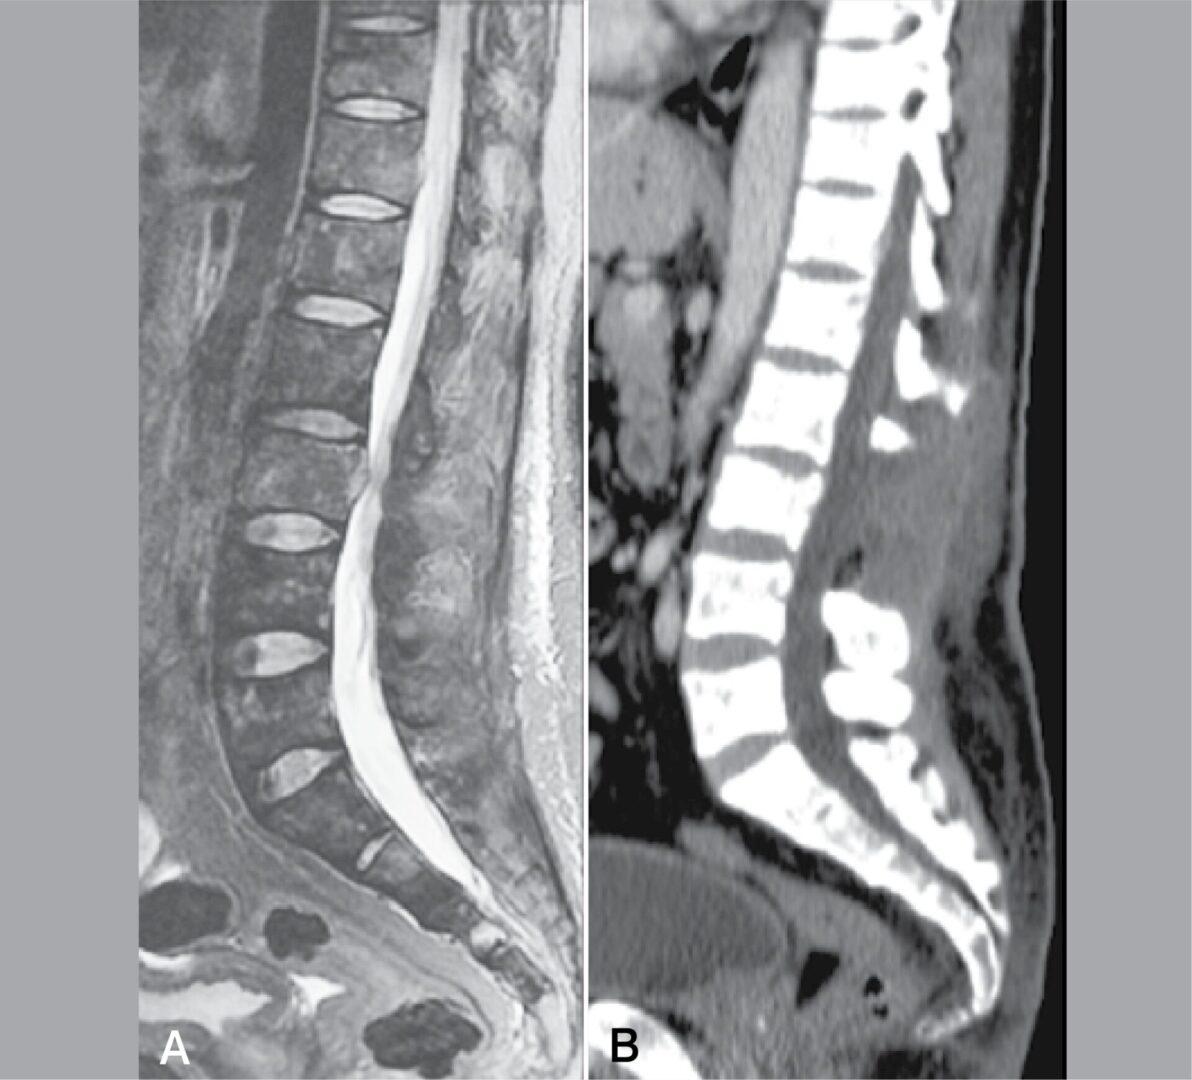 IVD MRI